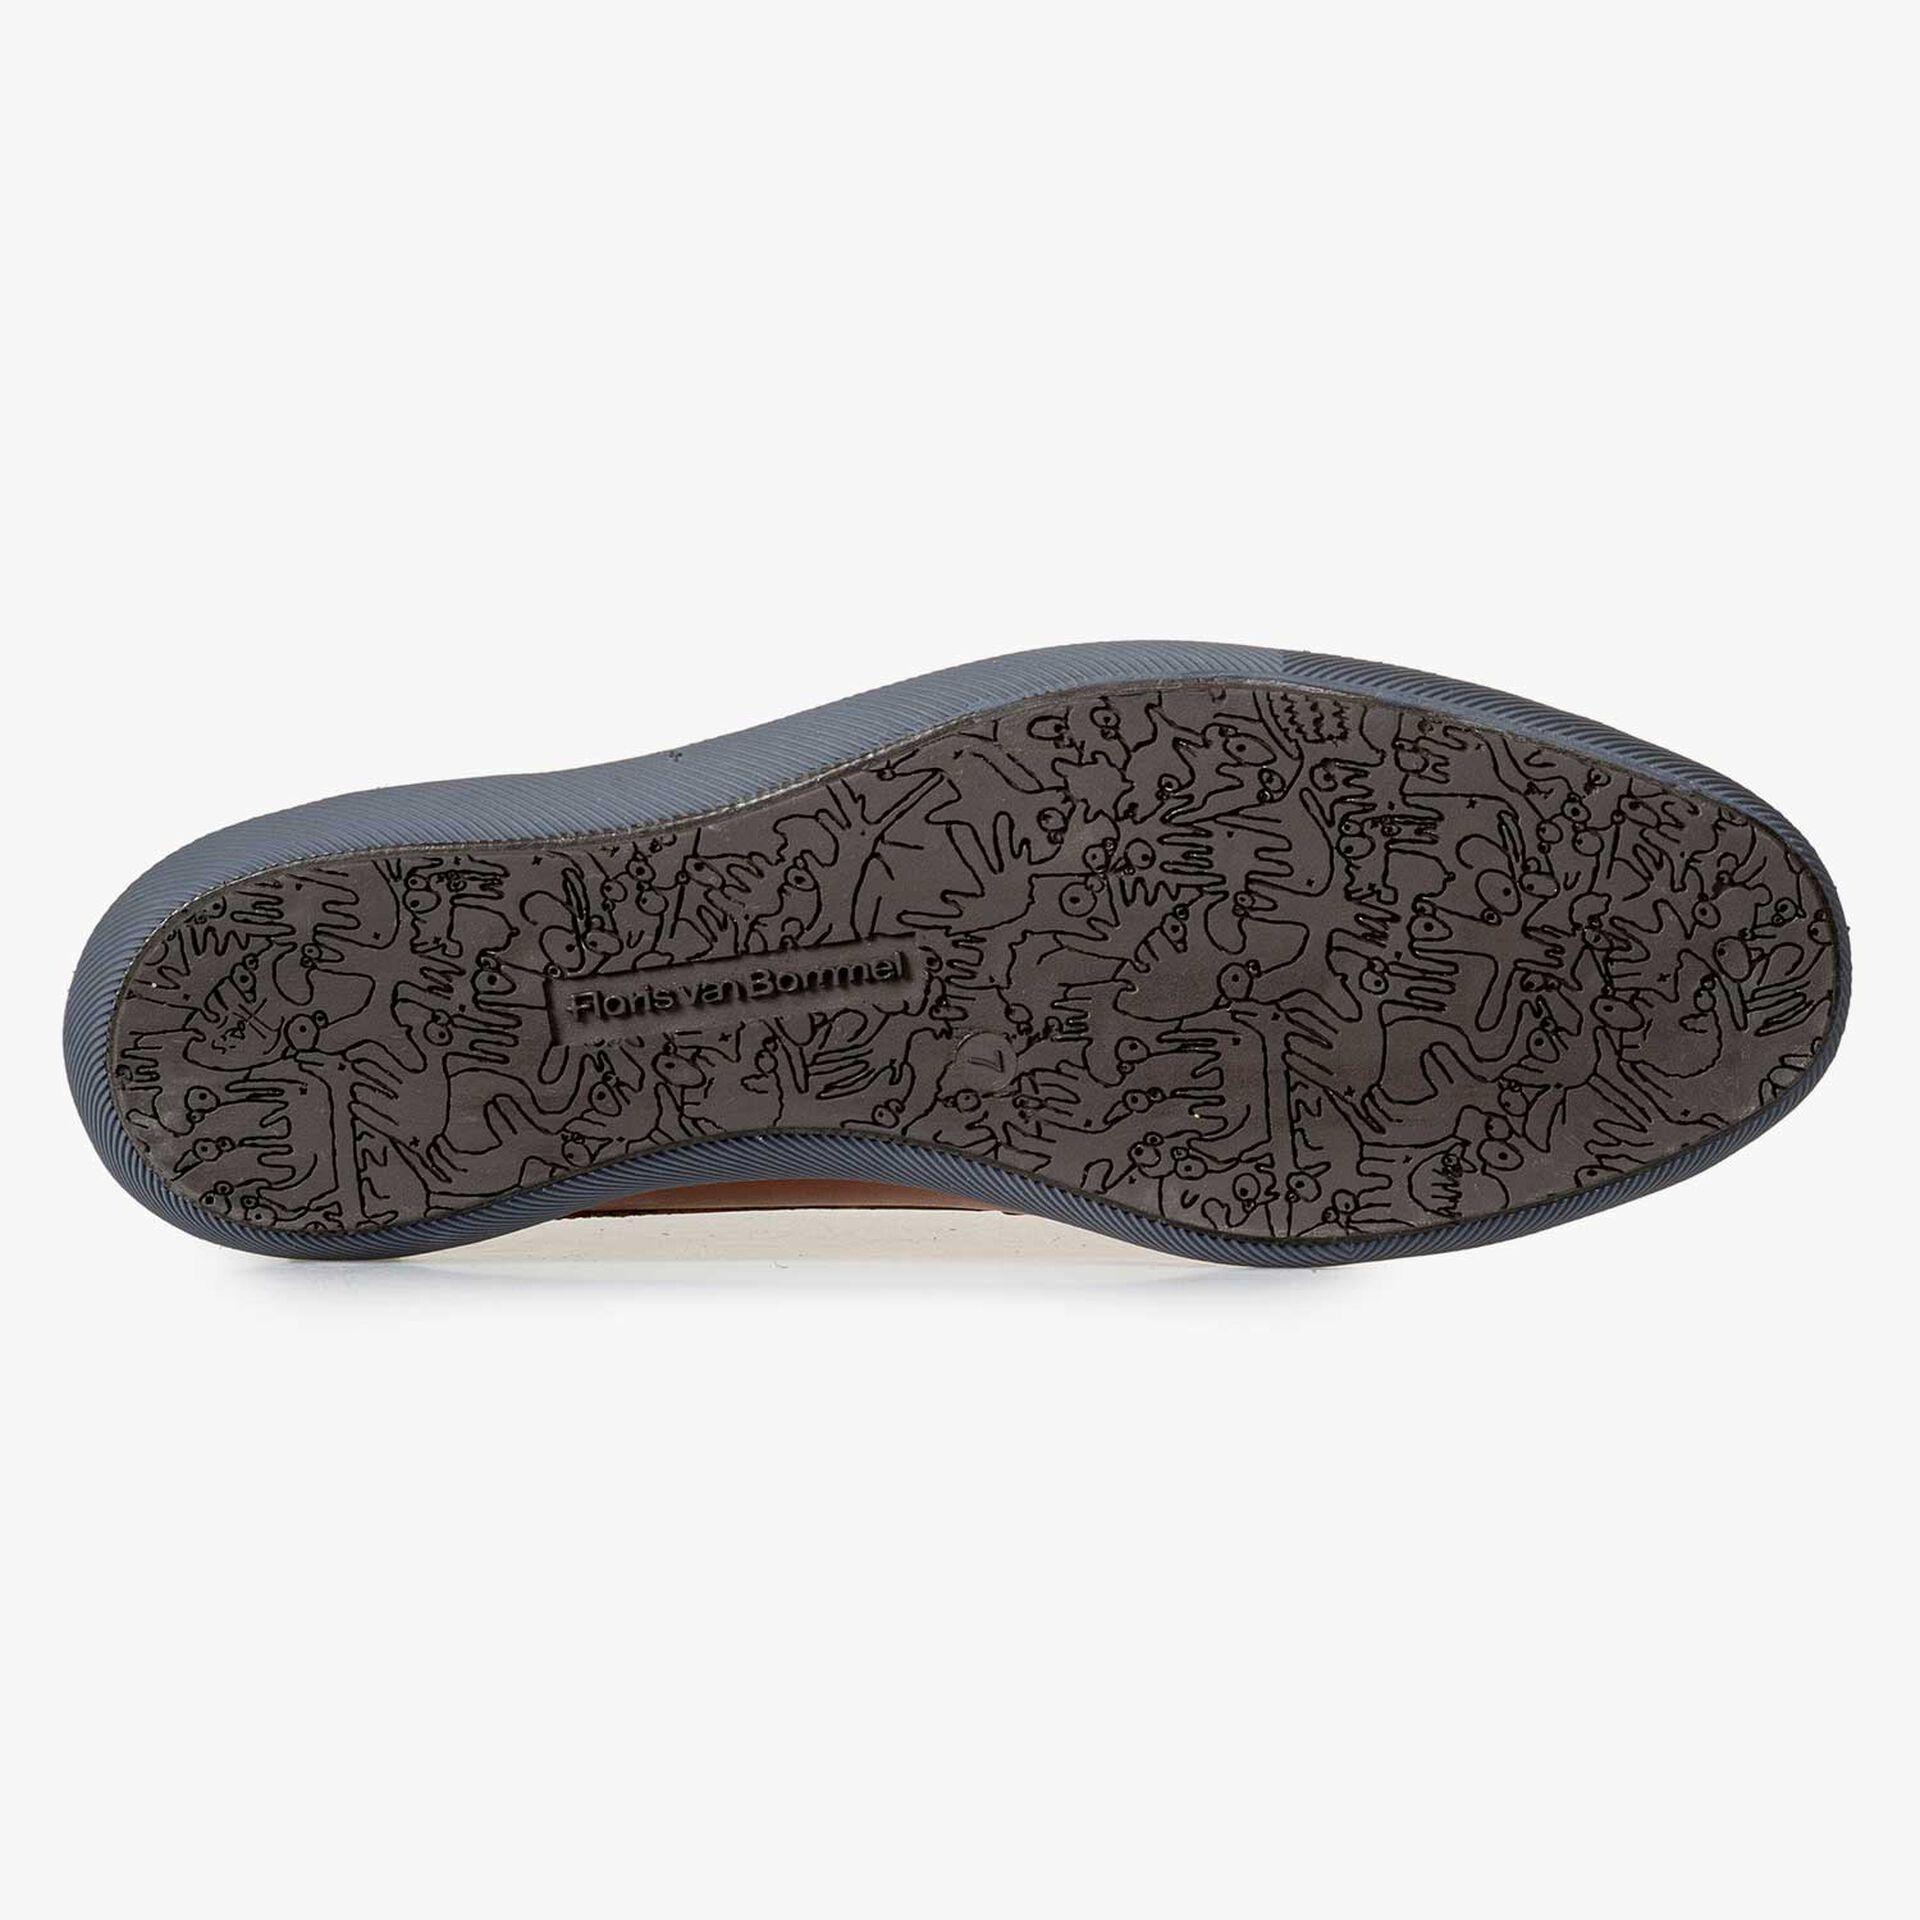 Dark cognac-coloured calf's leather boot